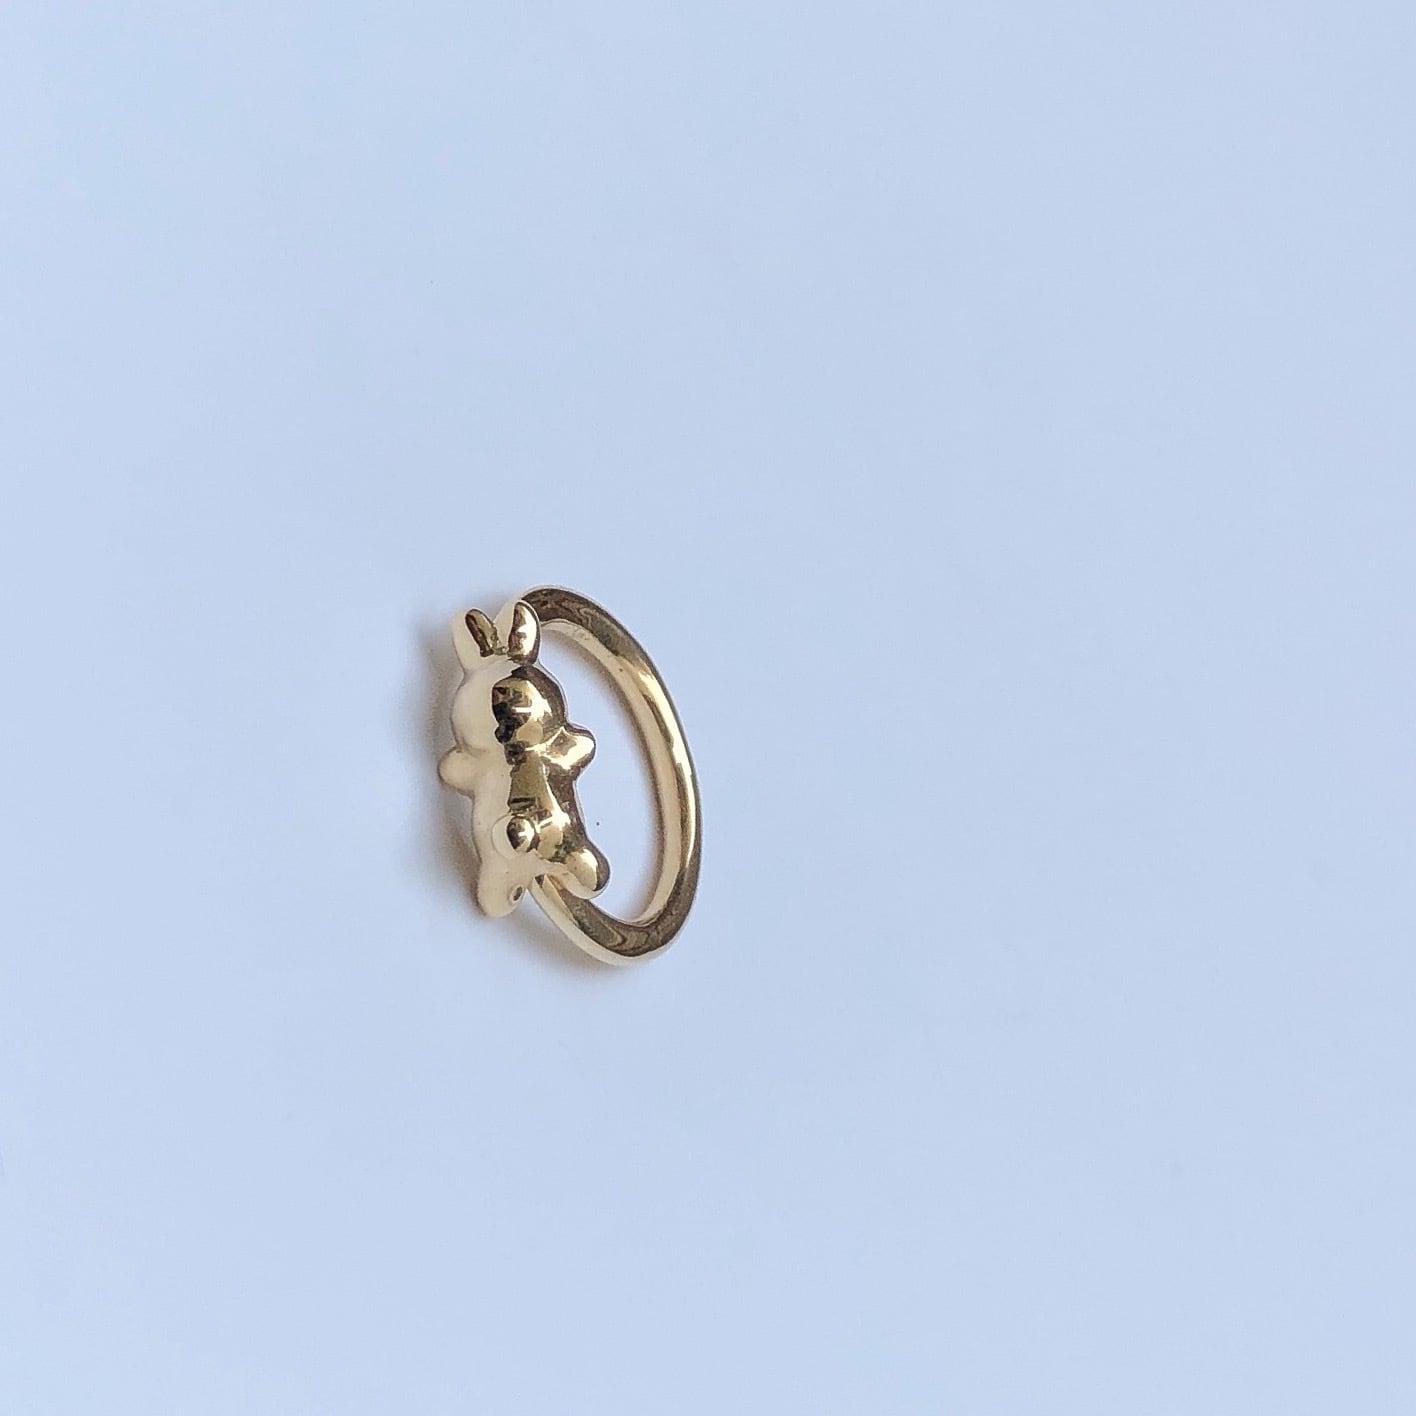 RABBIT CHARMのsnap RING body jewelry ® K10YG #0006 うさぎボディピアス・チャーム/10金イエローゴールド